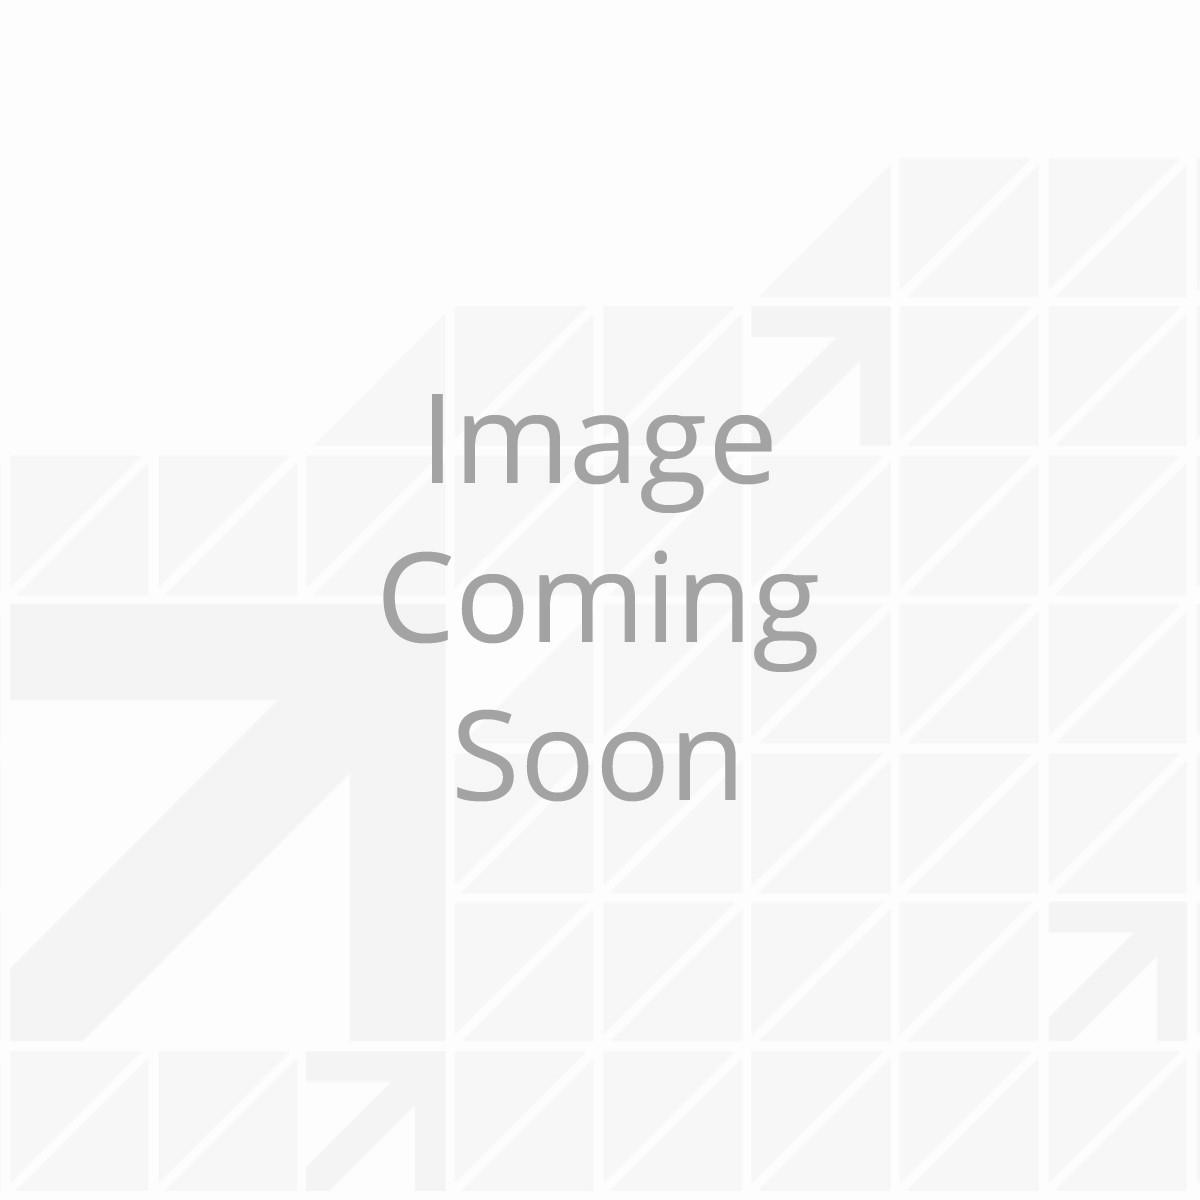 1170591_Jack-Brkt_001